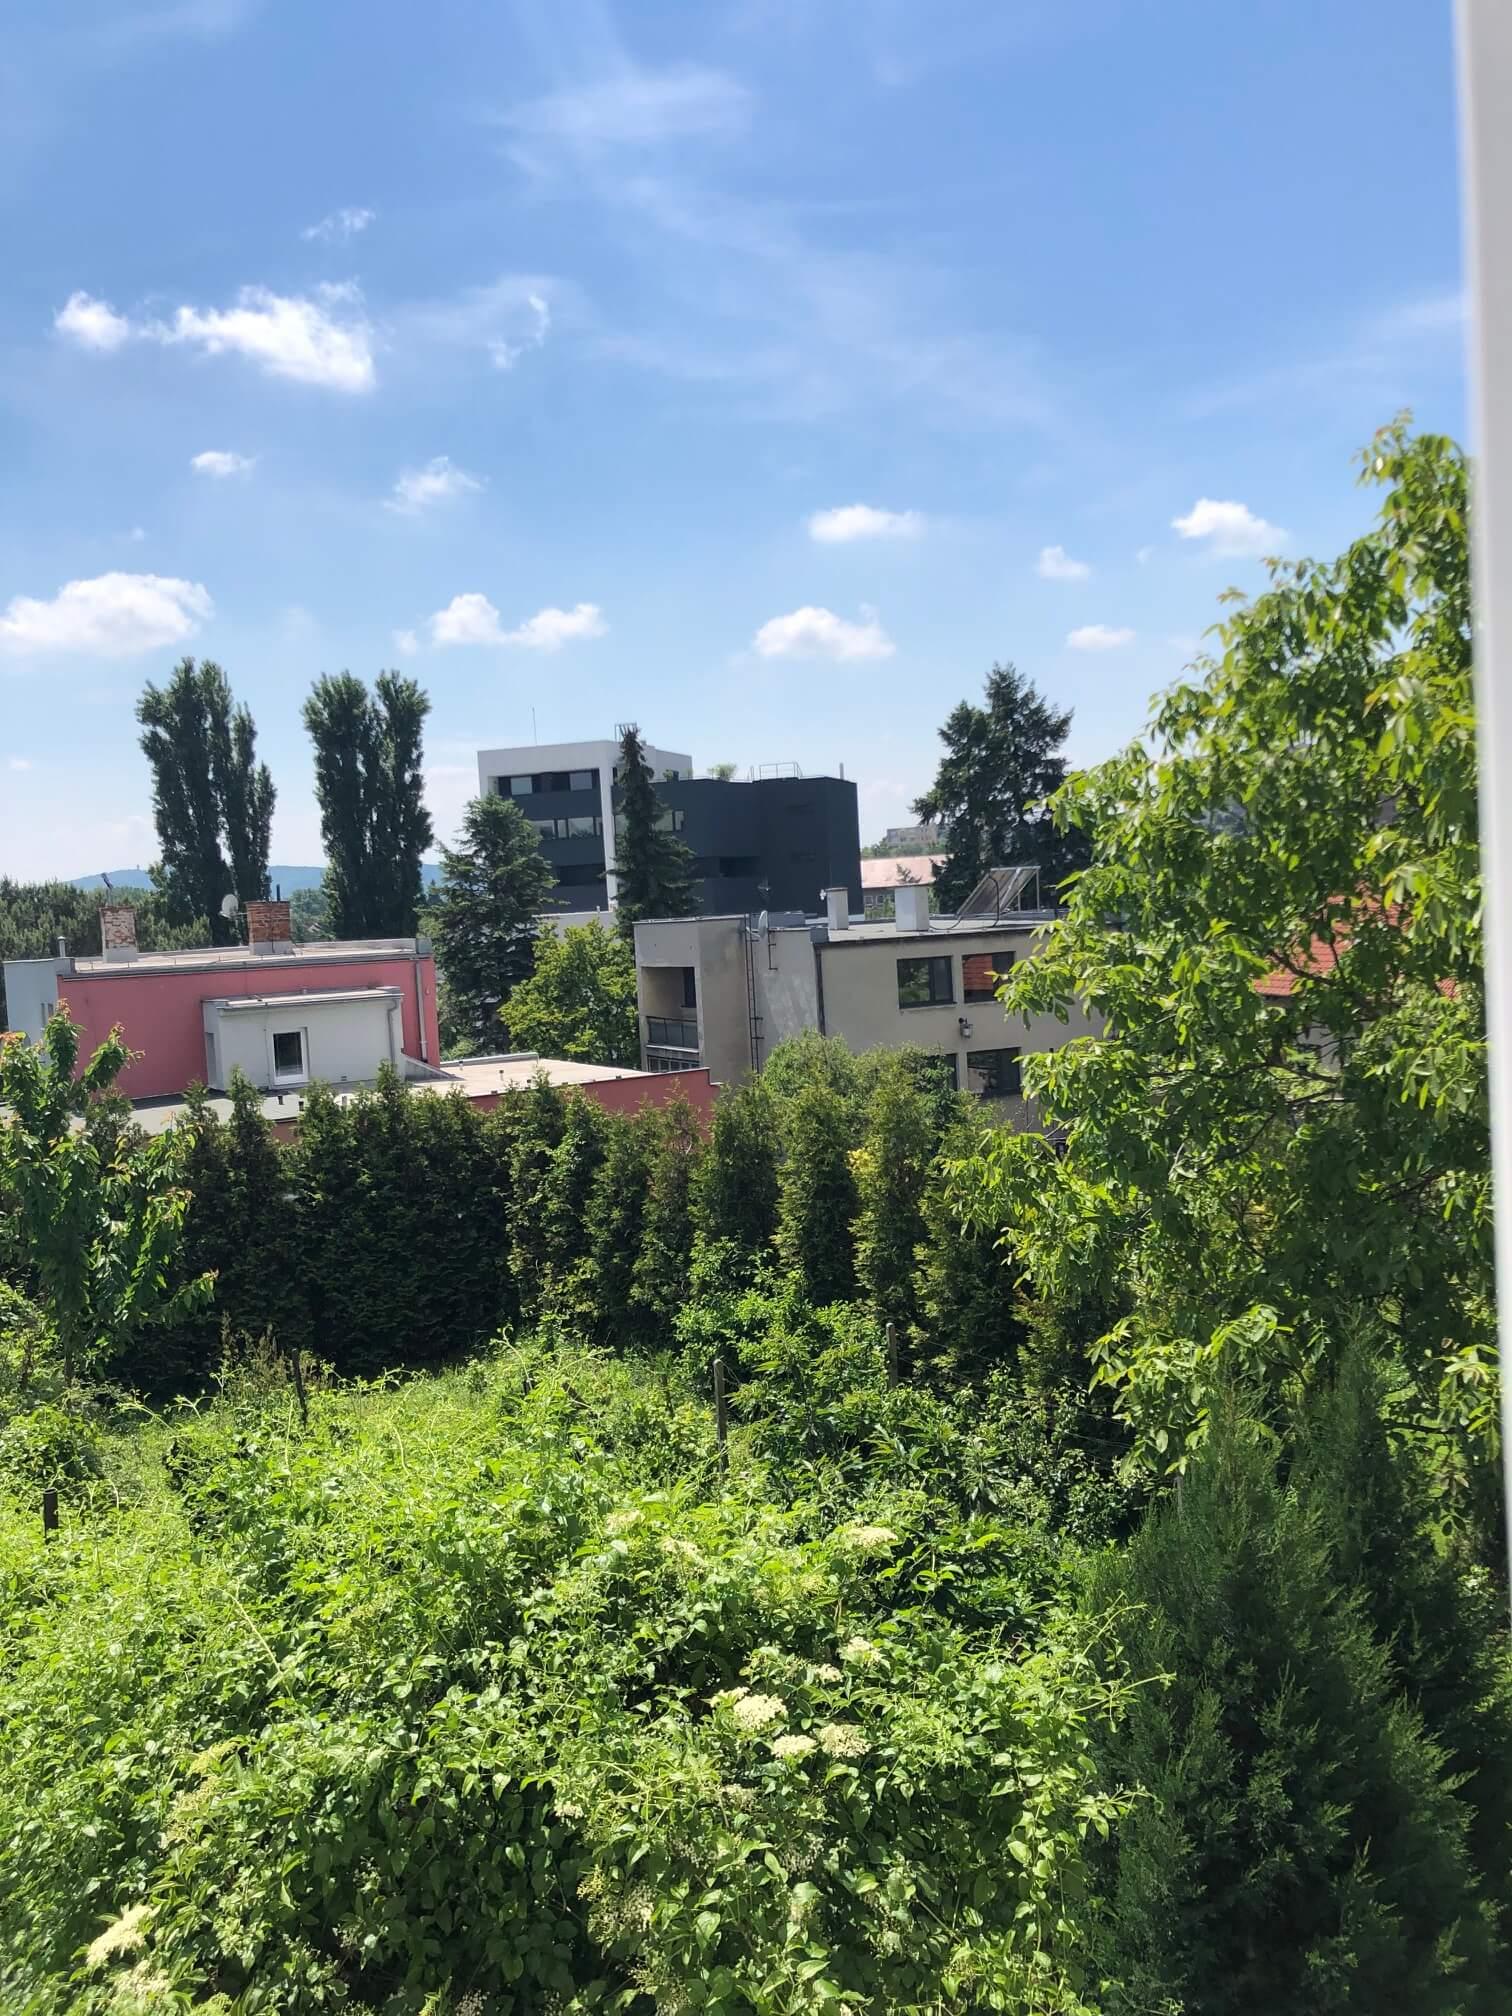 Rezervované: 3 izbový byt, novostavba, 72,25m2, loggia 4,82m2, Staré Grunty, Karlovka, garážové státie-18